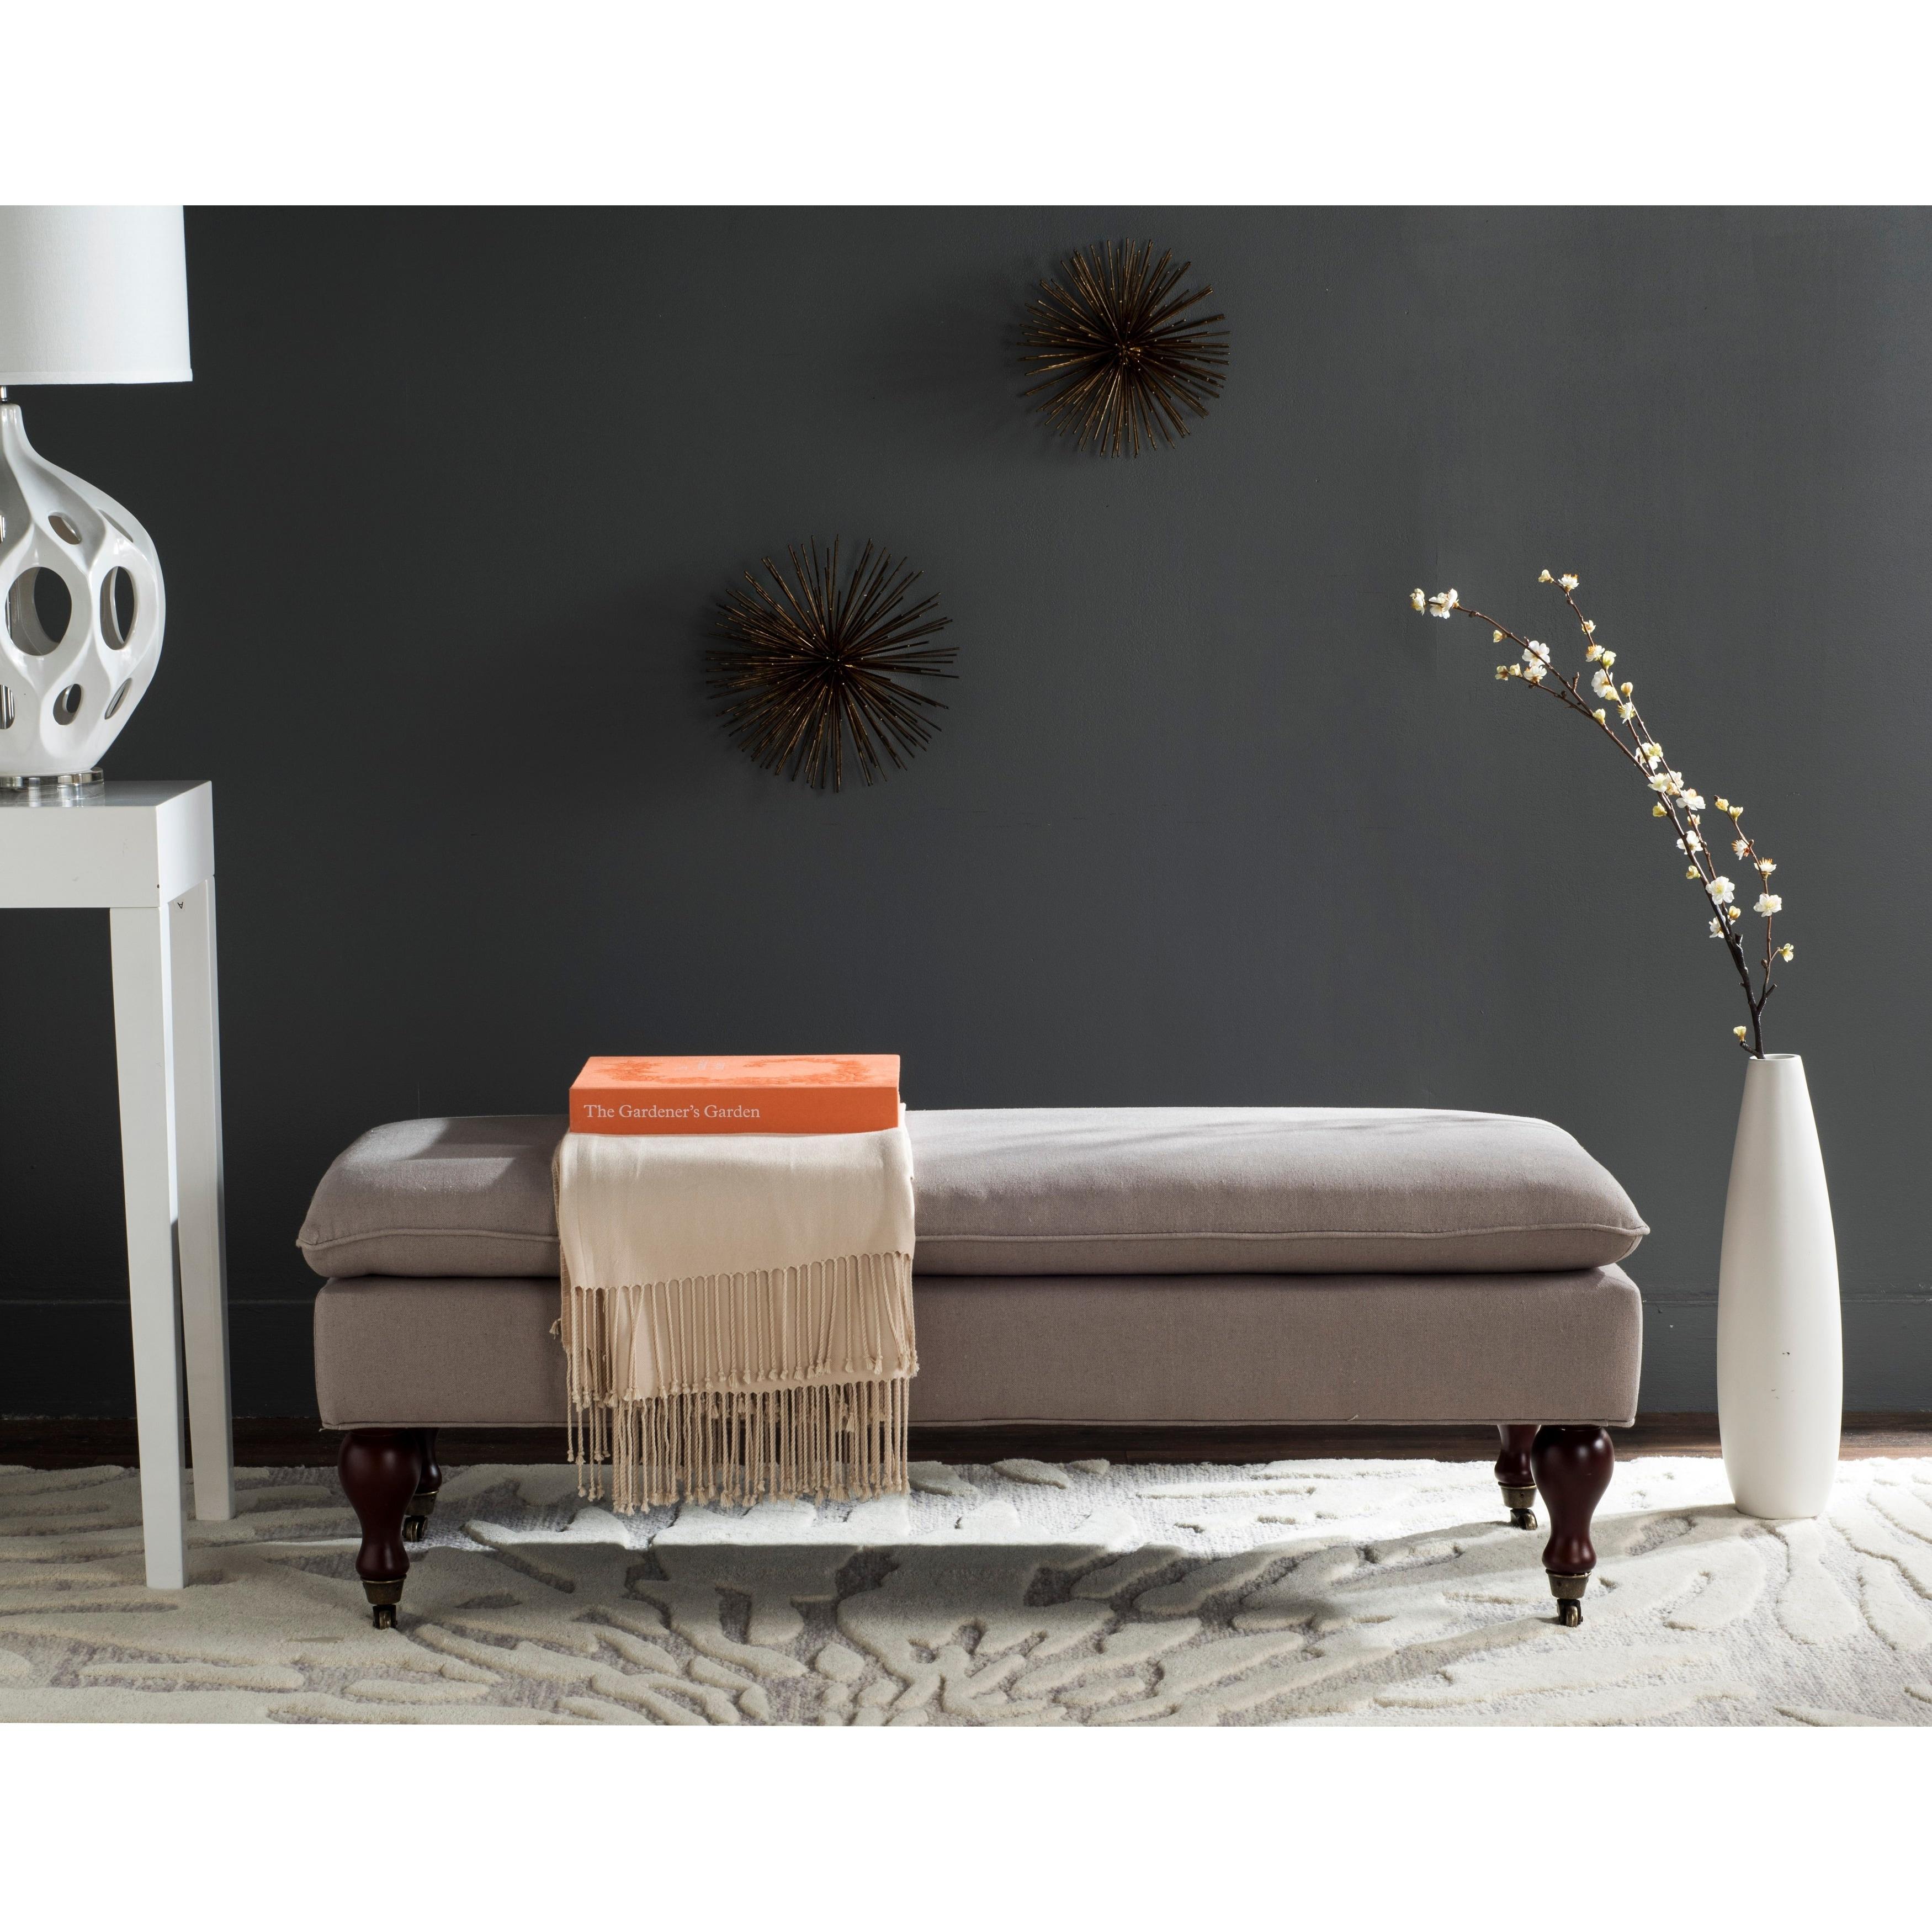 Shop Safavieh Mansfield Linen Pillowtop Ottoman - On Sale - Free ...